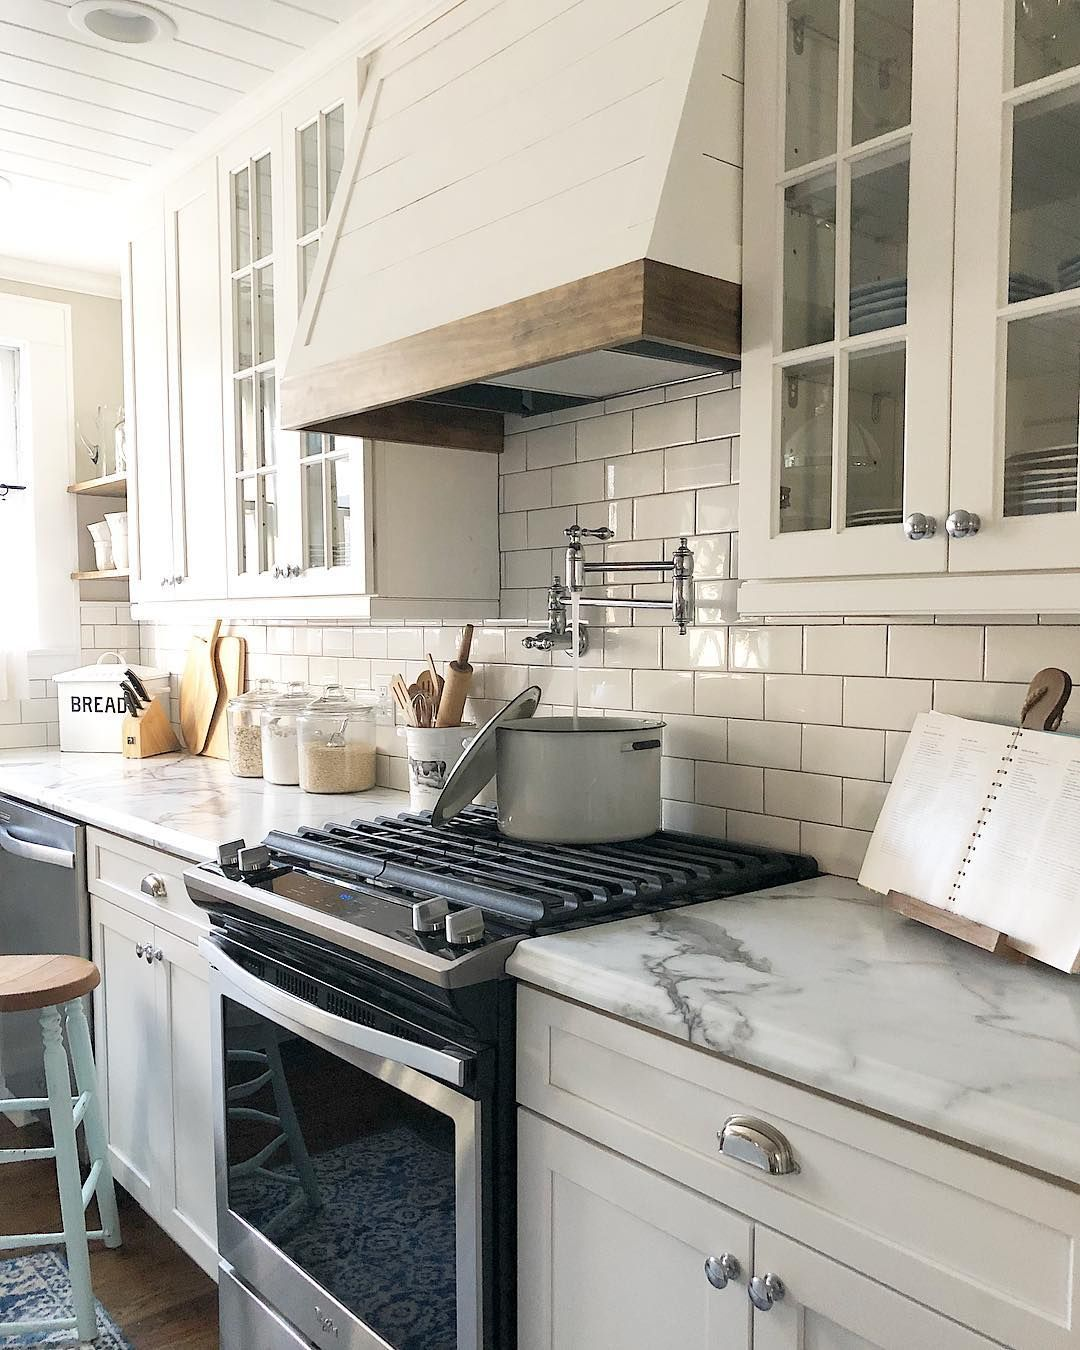 pin by lynnette vancleave on dream kitchen in 2018 rh pinterest com